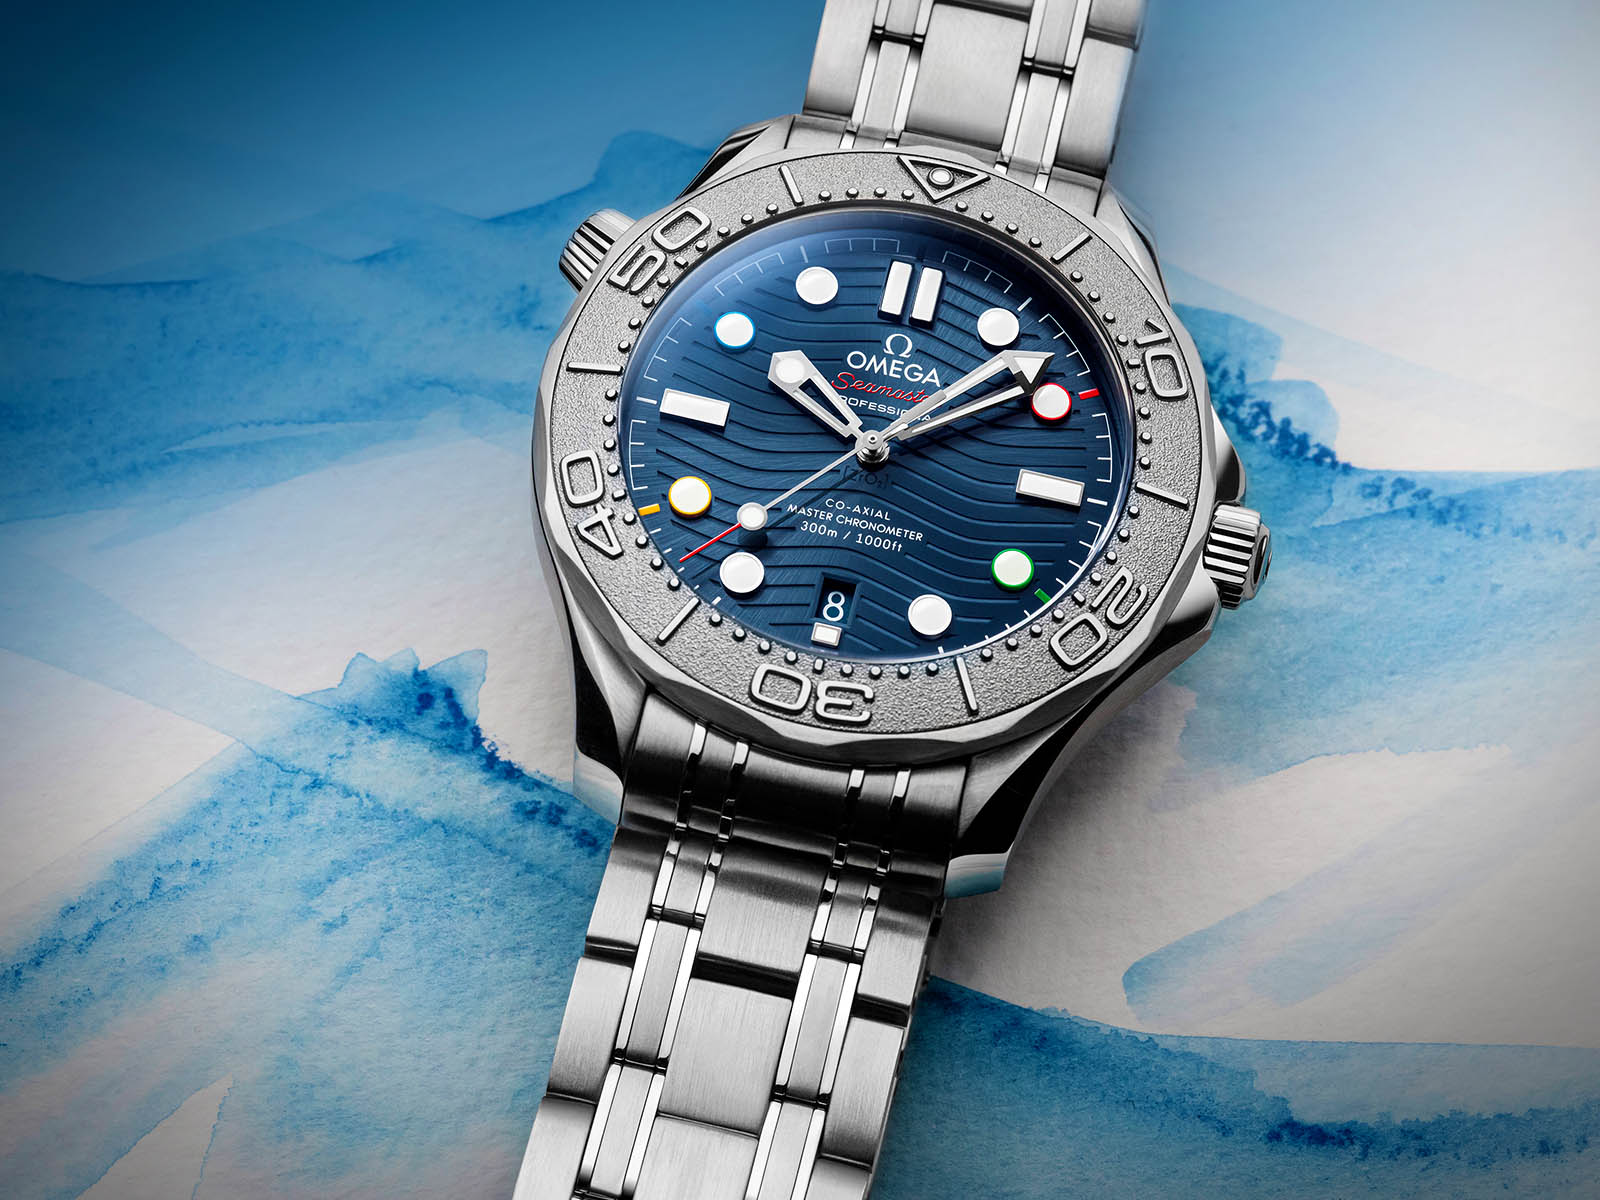 522-30-42-20-03-001-omega-seamaster-diver-300m-beijing-2022-special-edition-2.jpg